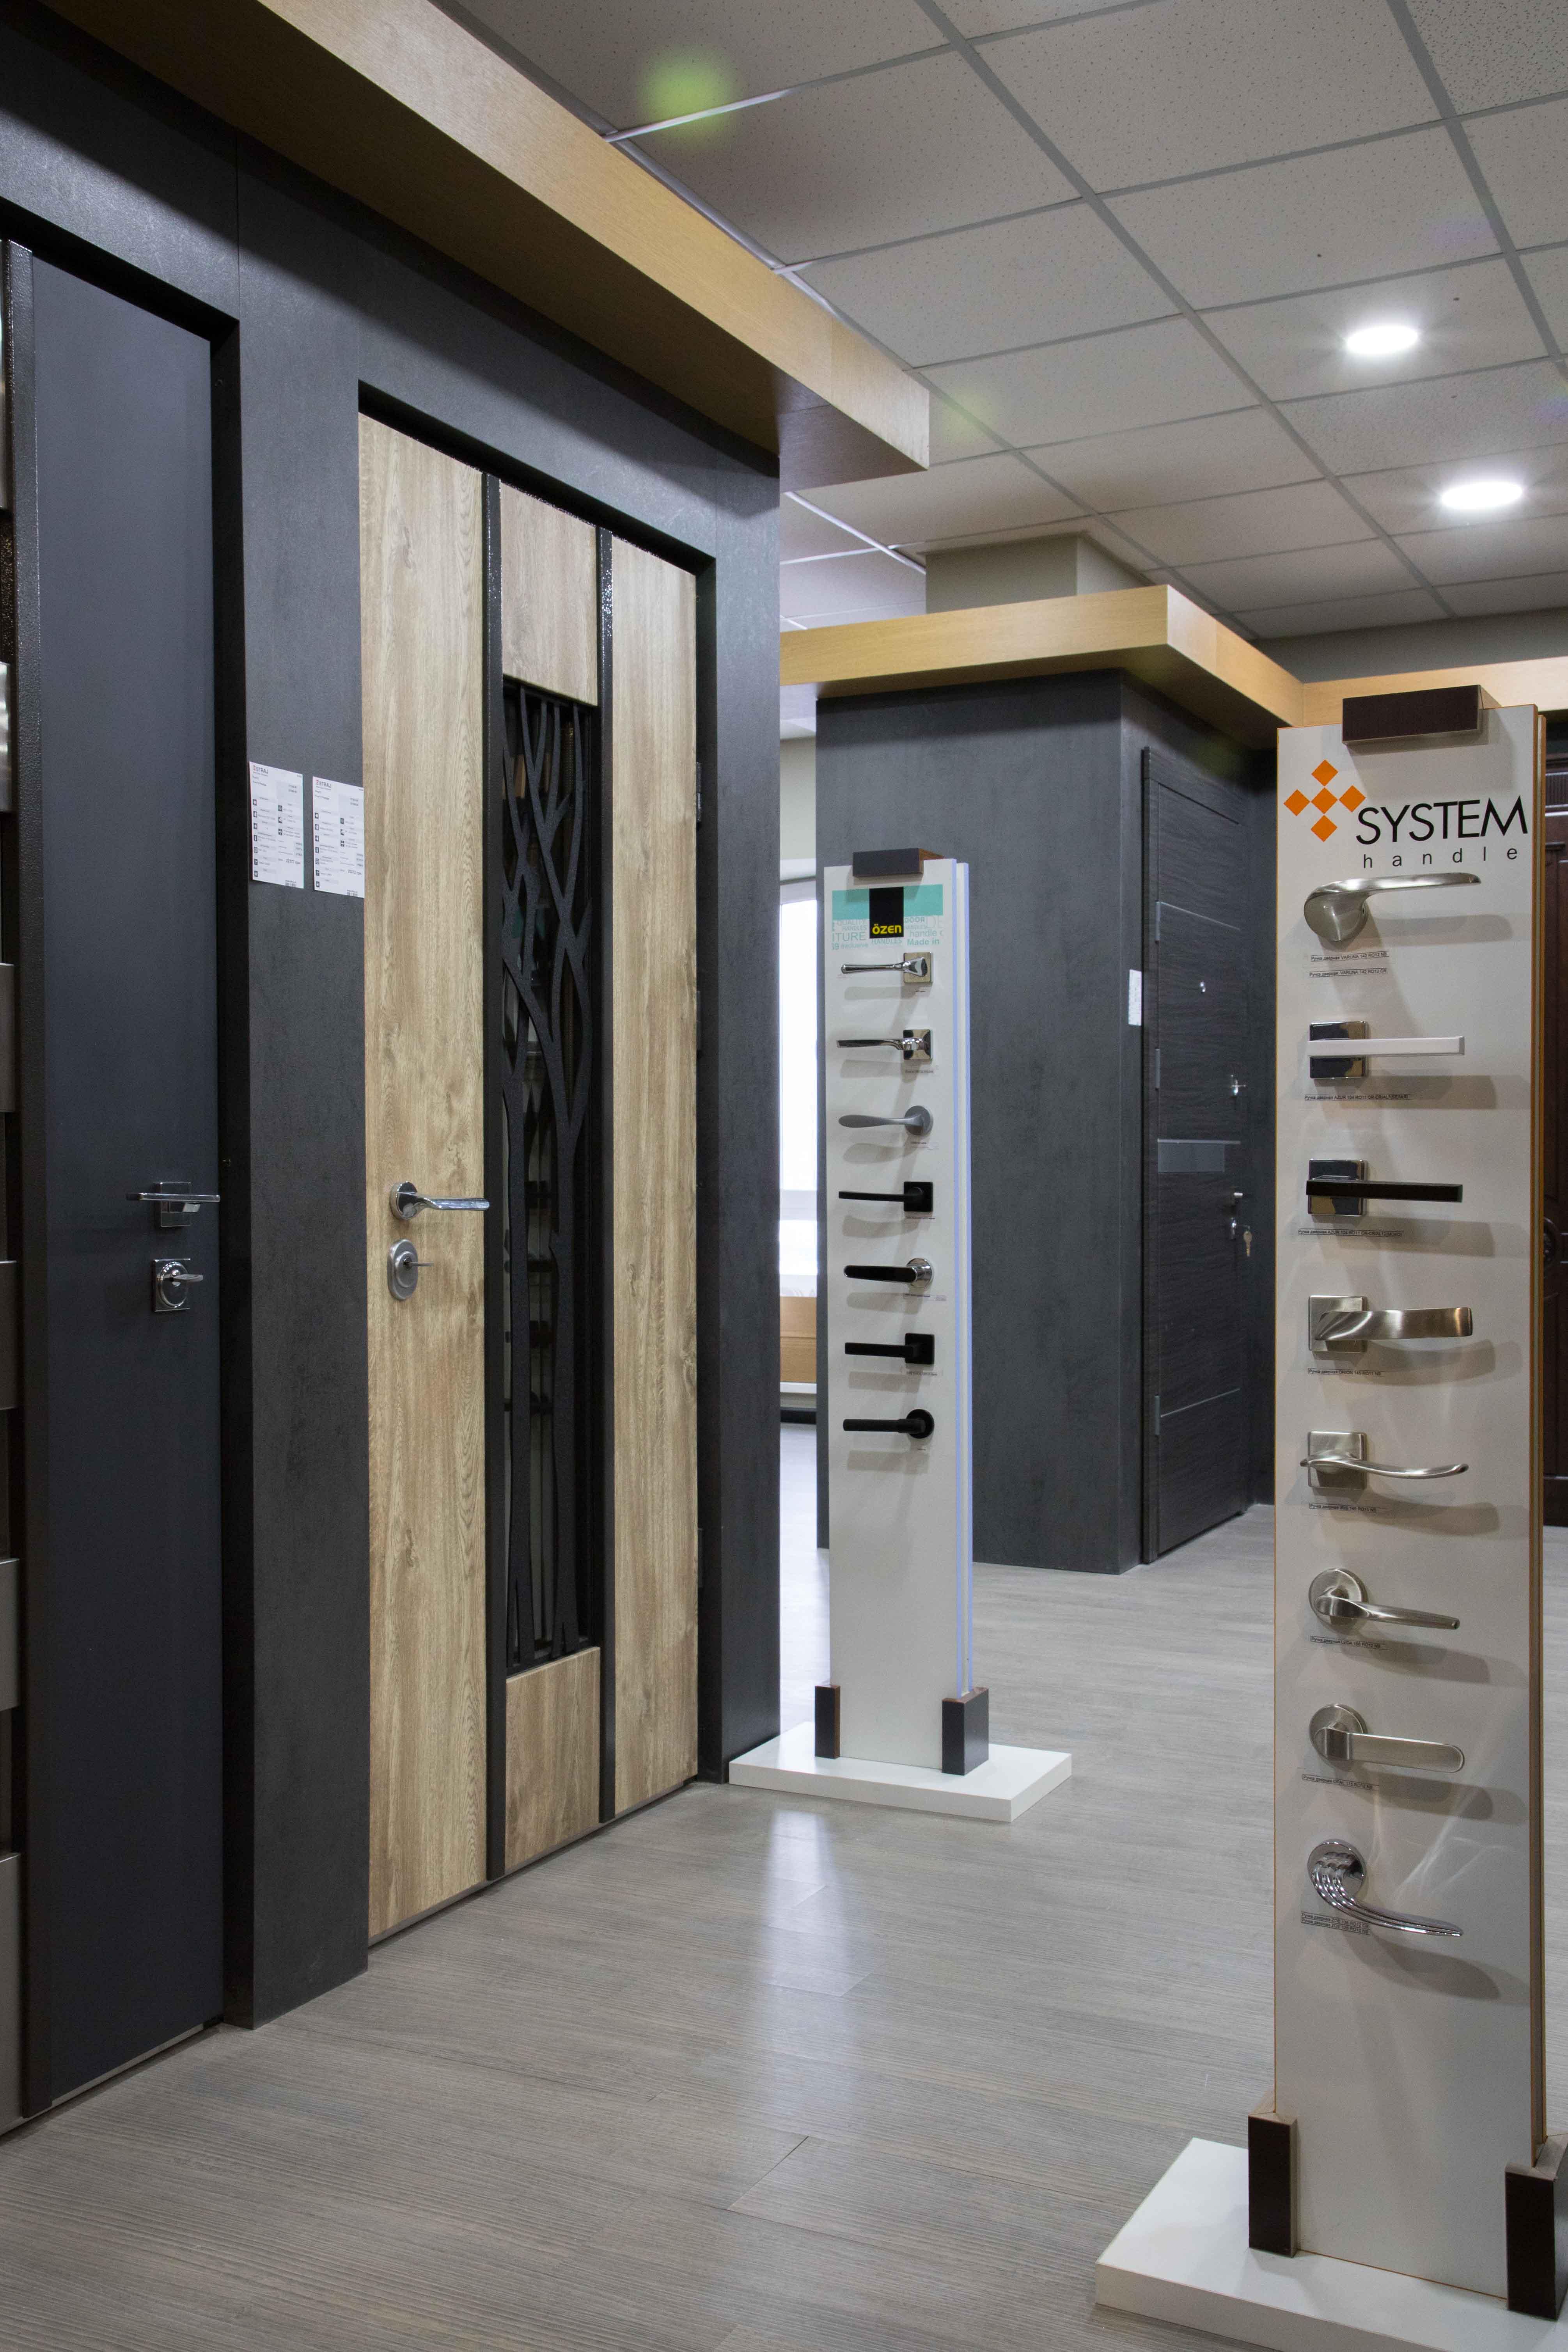 doctorlocks-замки Mul-t-lock Abloy Mottura двери СТРАЖ сейфи GRIFFON